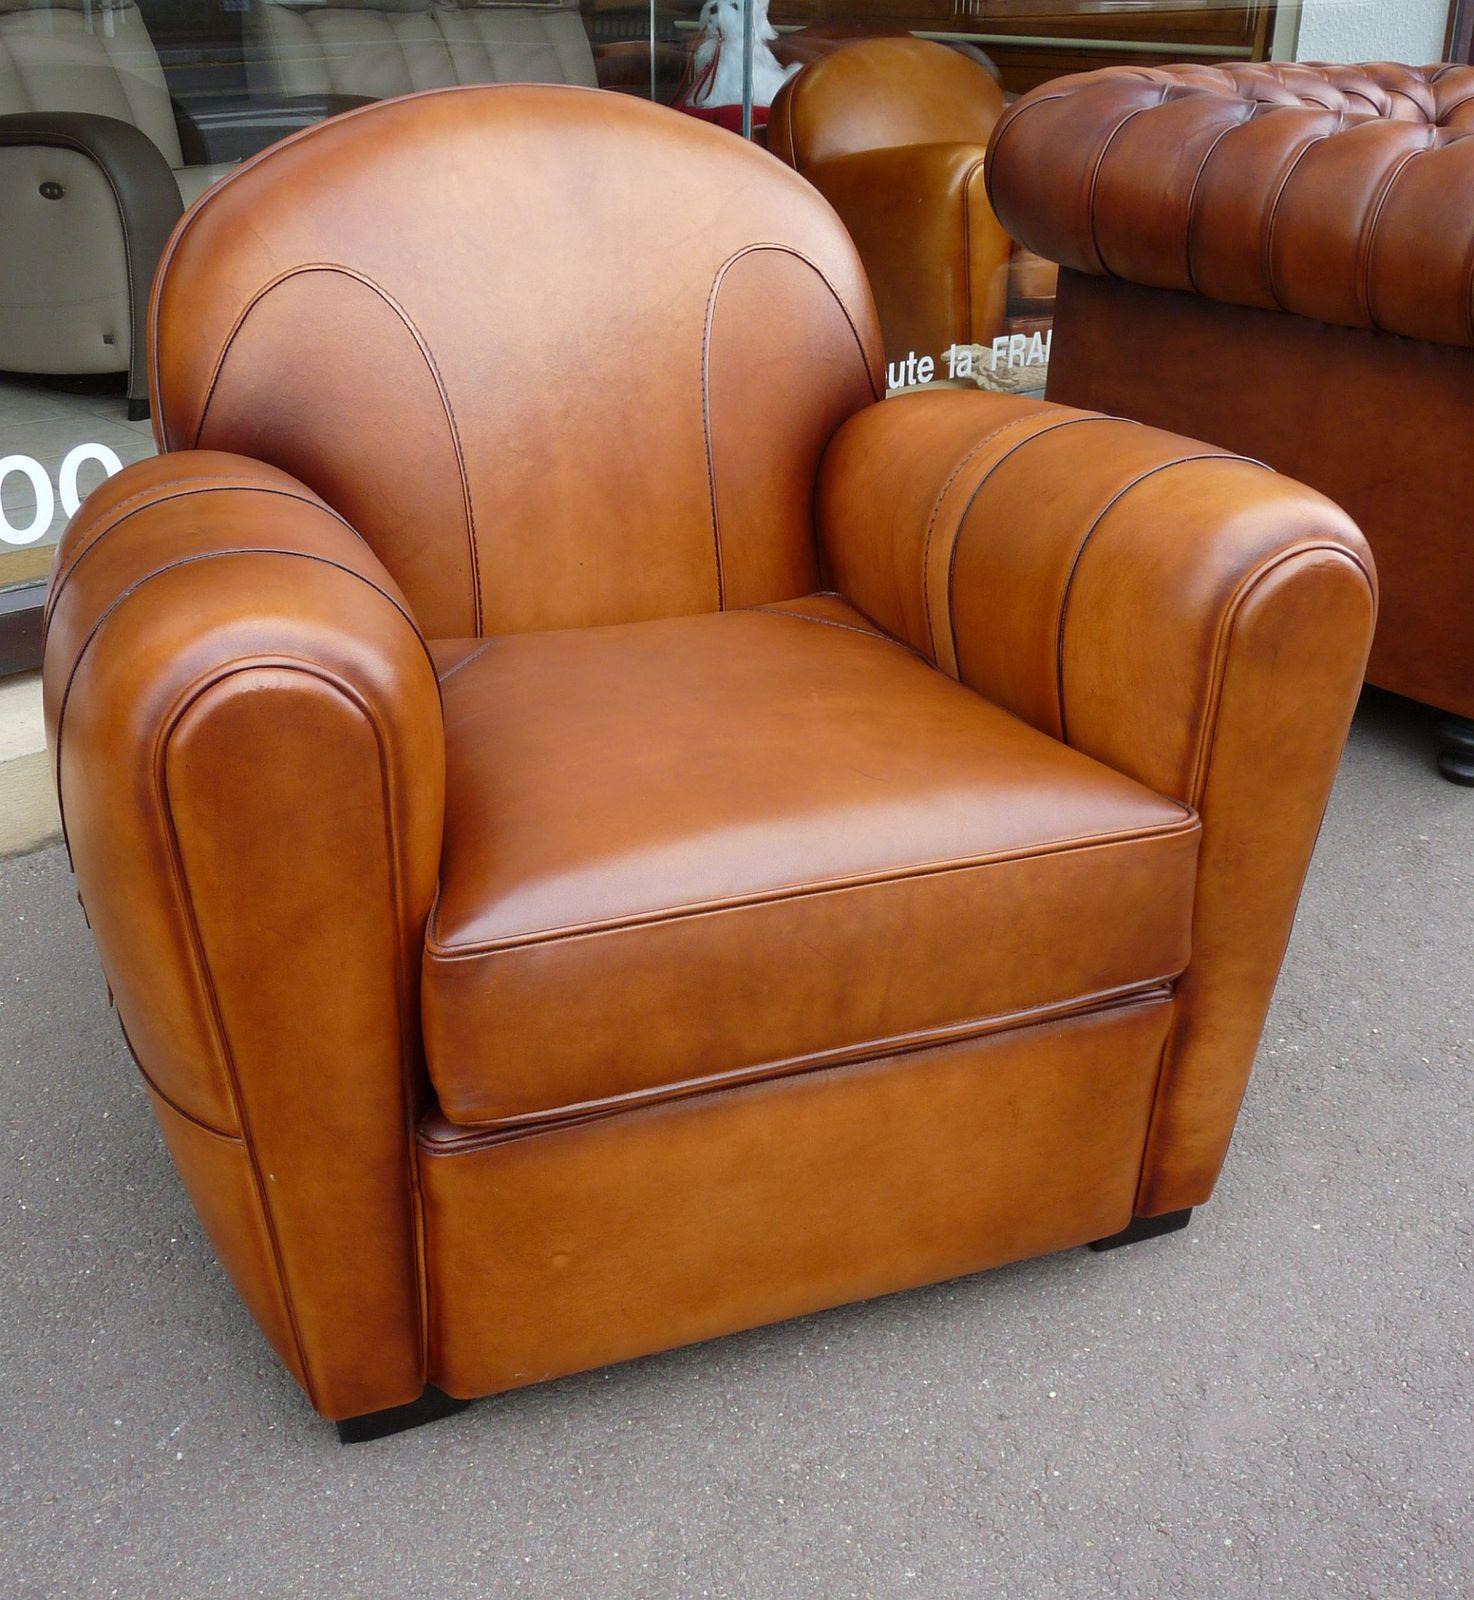 fauteuils club en cuir v ritable meubles doudard meubles en bois massif meubles doudard. Black Bedroom Furniture Sets. Home Design Ideas